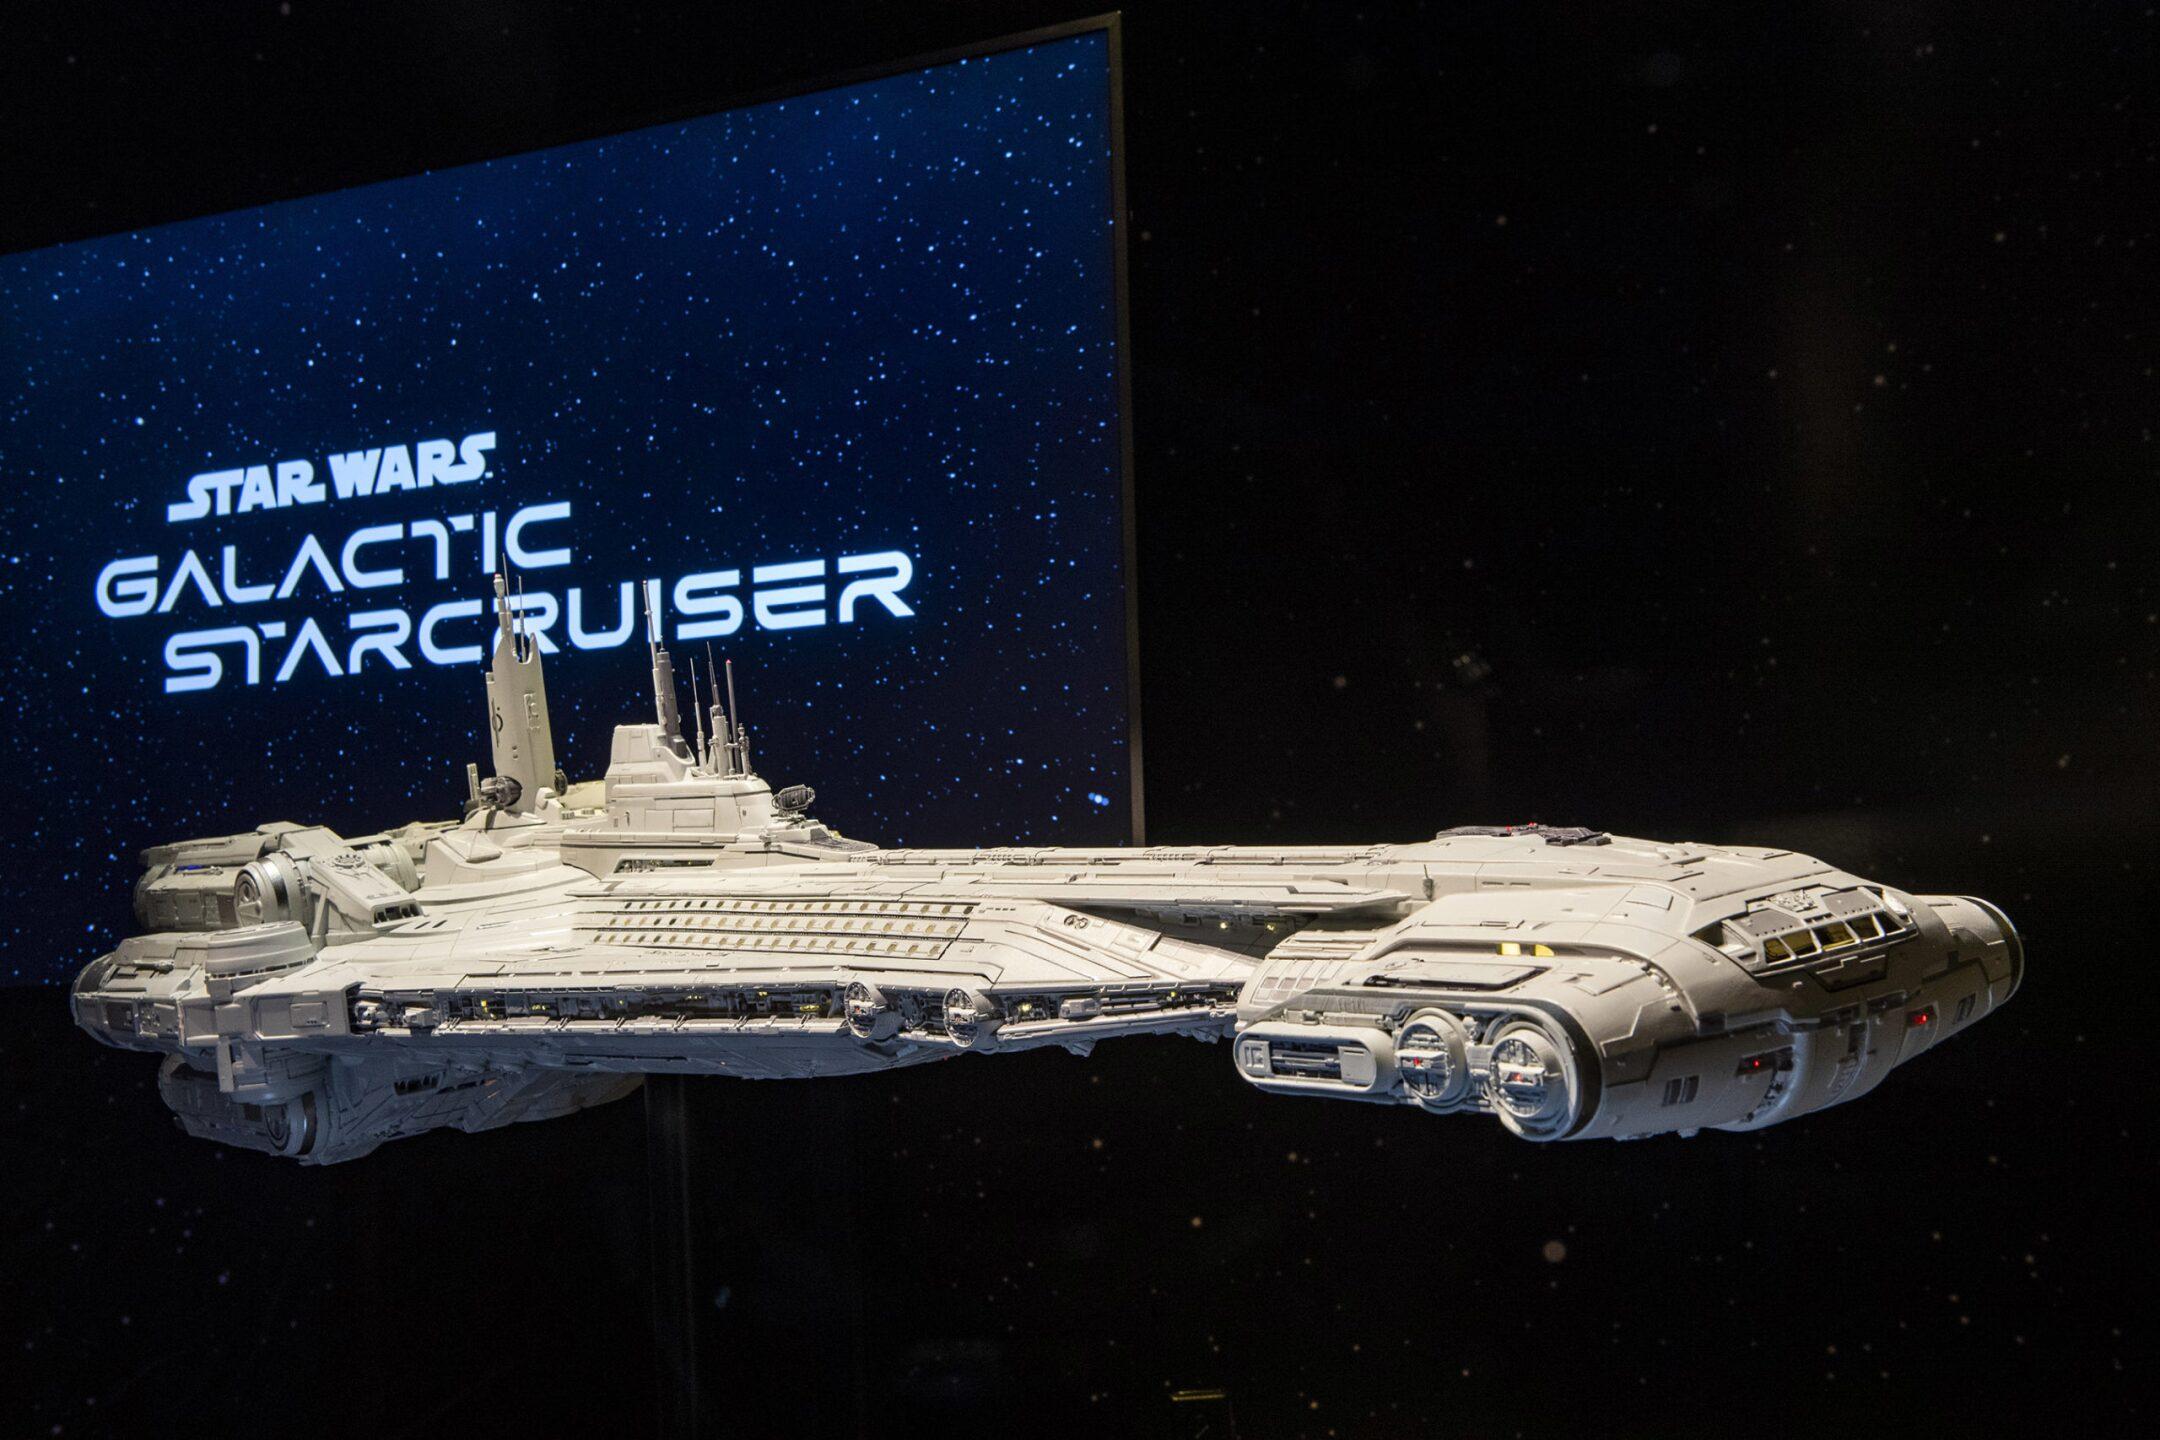 Star Wars: Galactic Starcruiser Model at Disney's Hollywood Stud